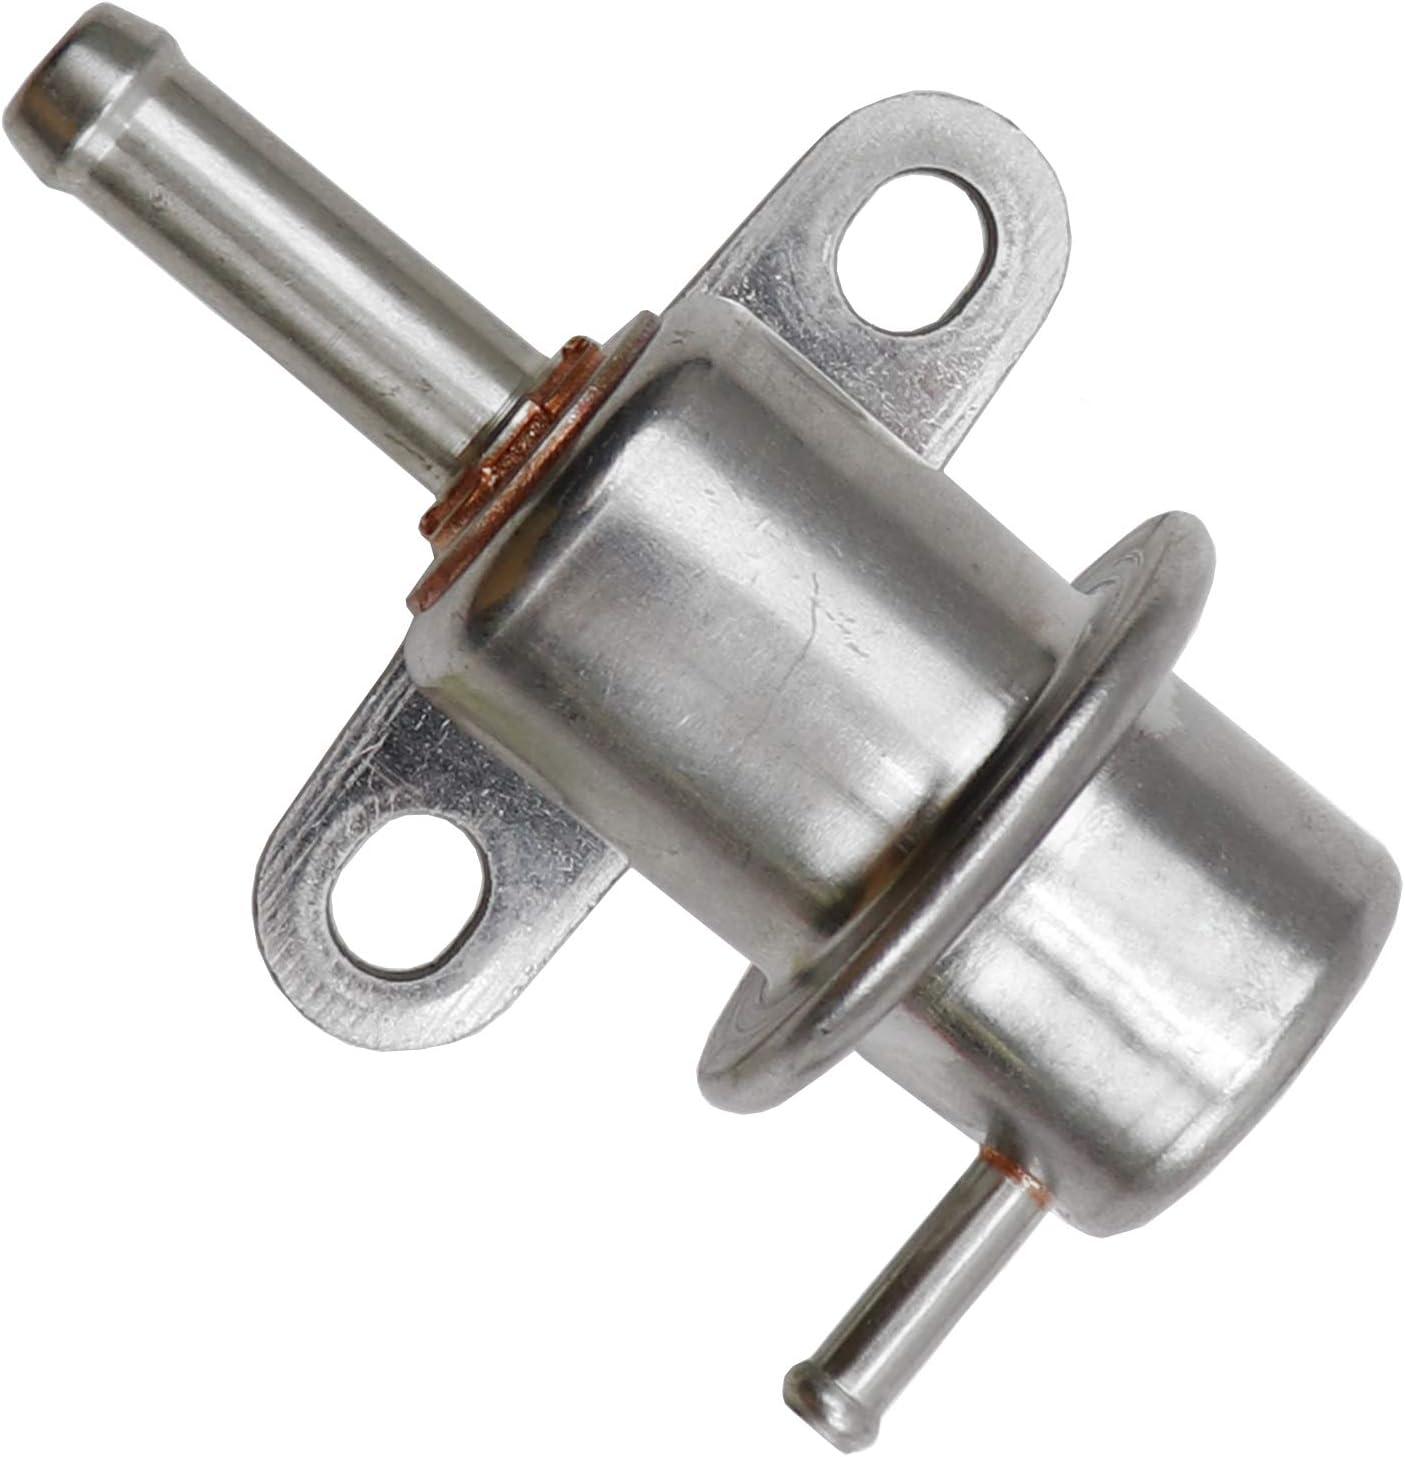 Beck Arnley 158-0973 Fuel Injection Pressure Regulator